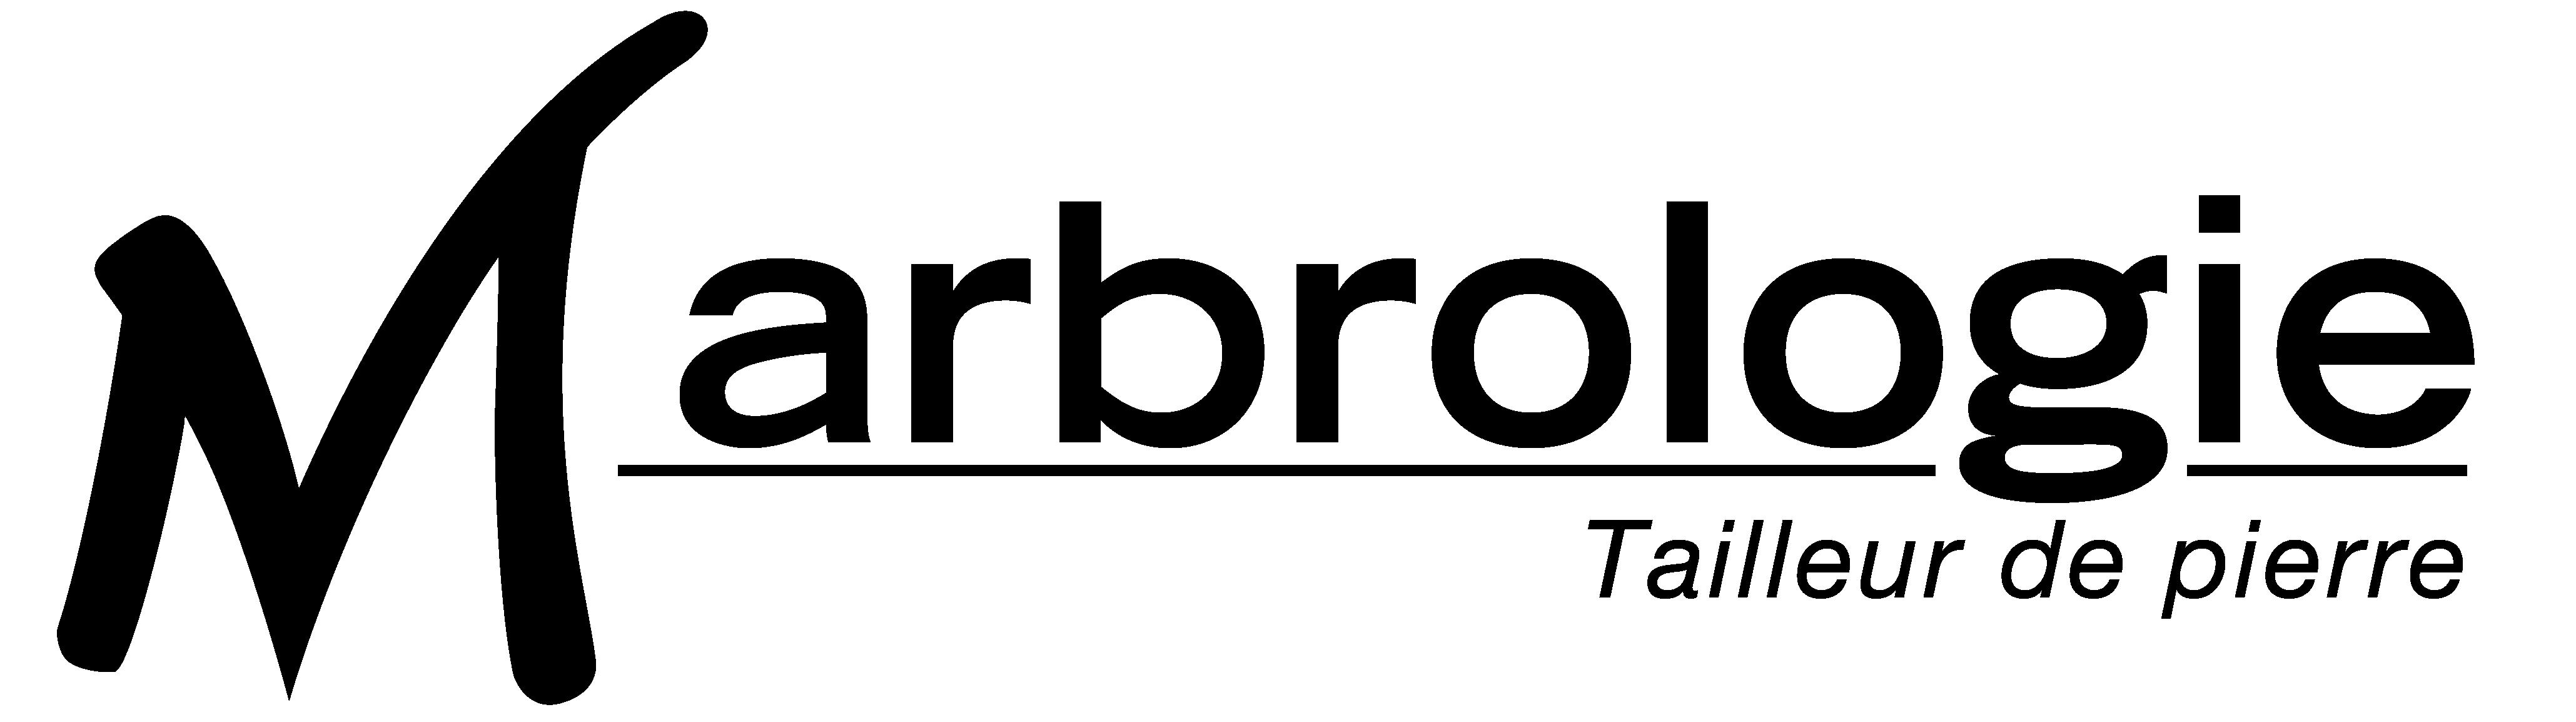 Modrox